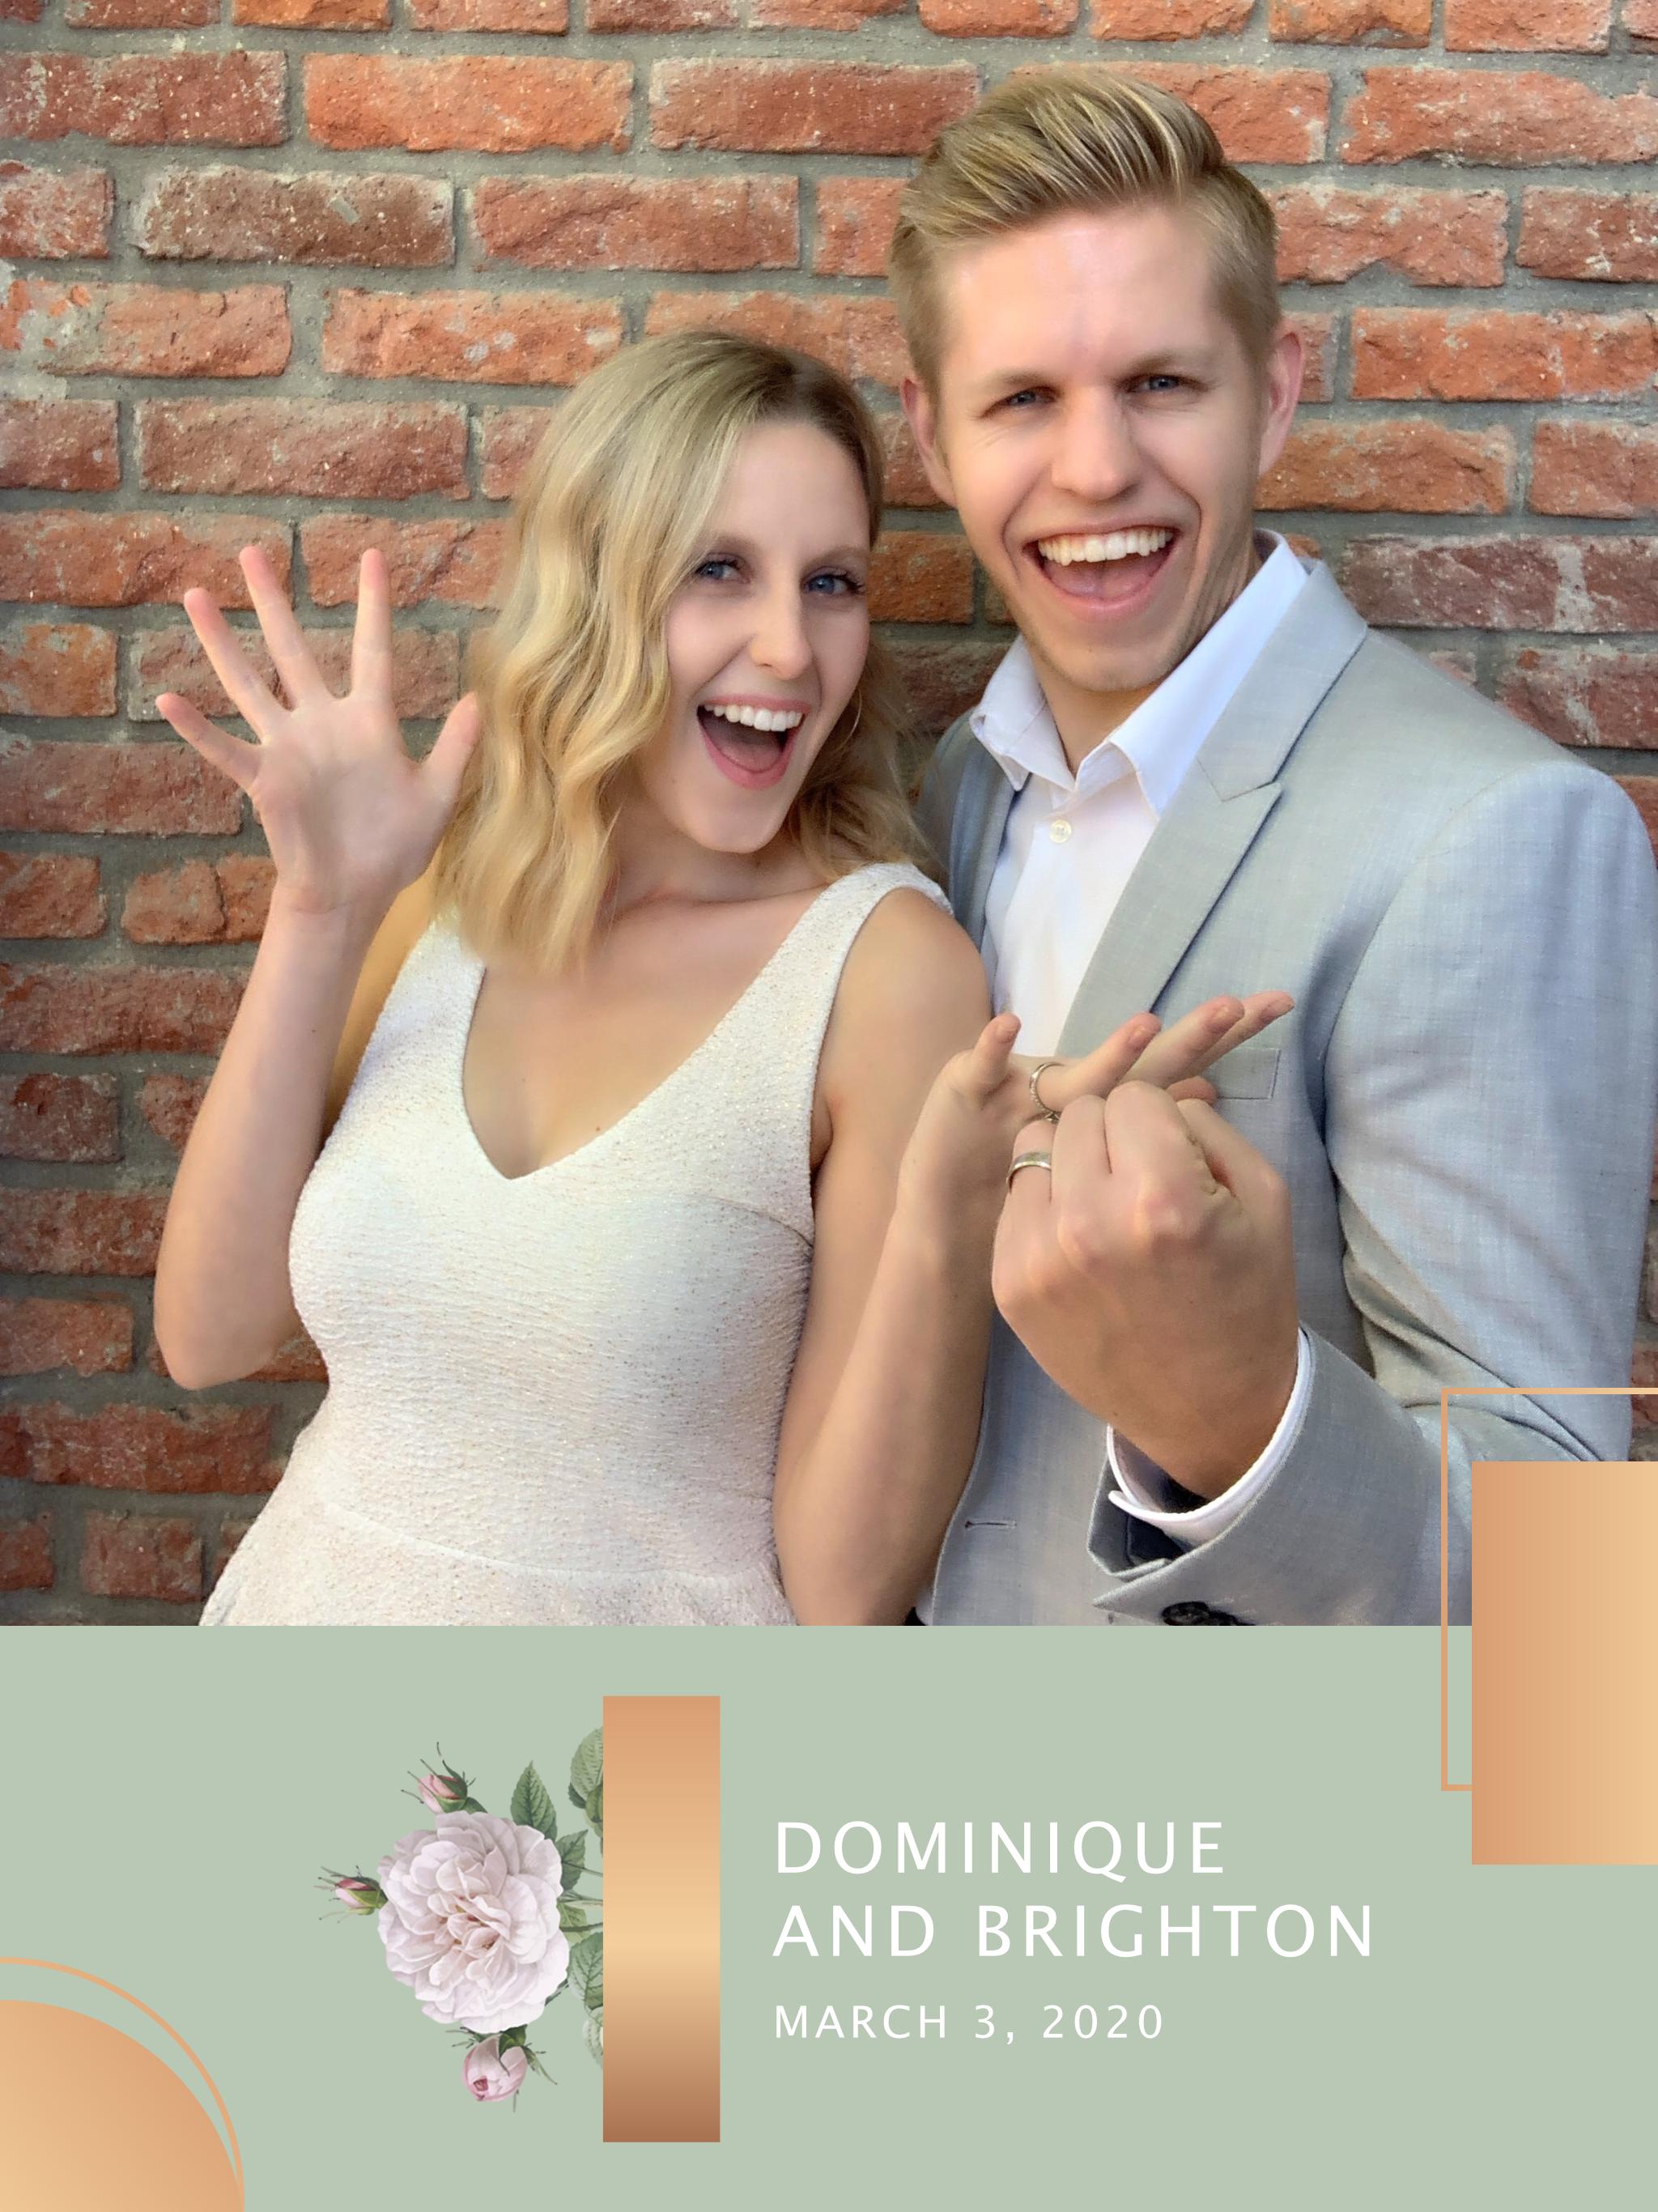 wedding digital overlay 1 2